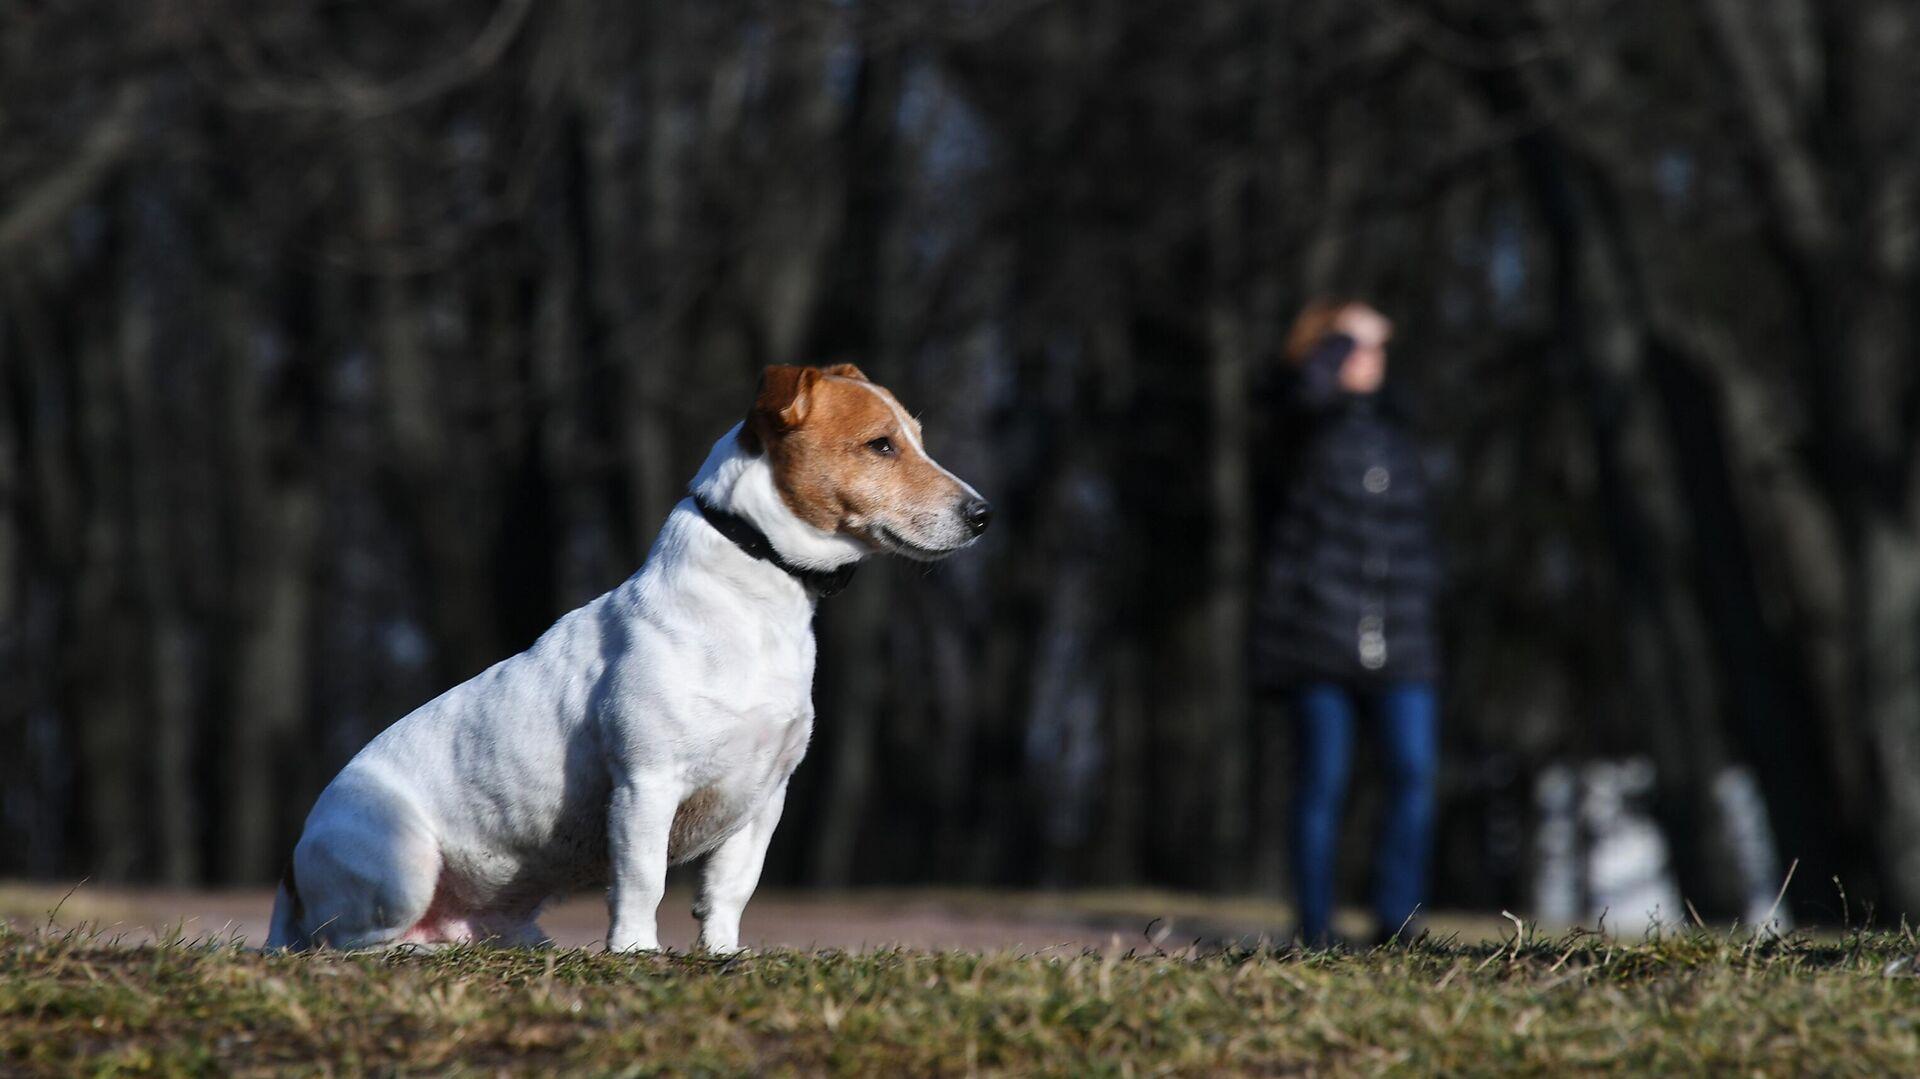 Собака в парке - РИА Новости, 1920, 05.03.2021